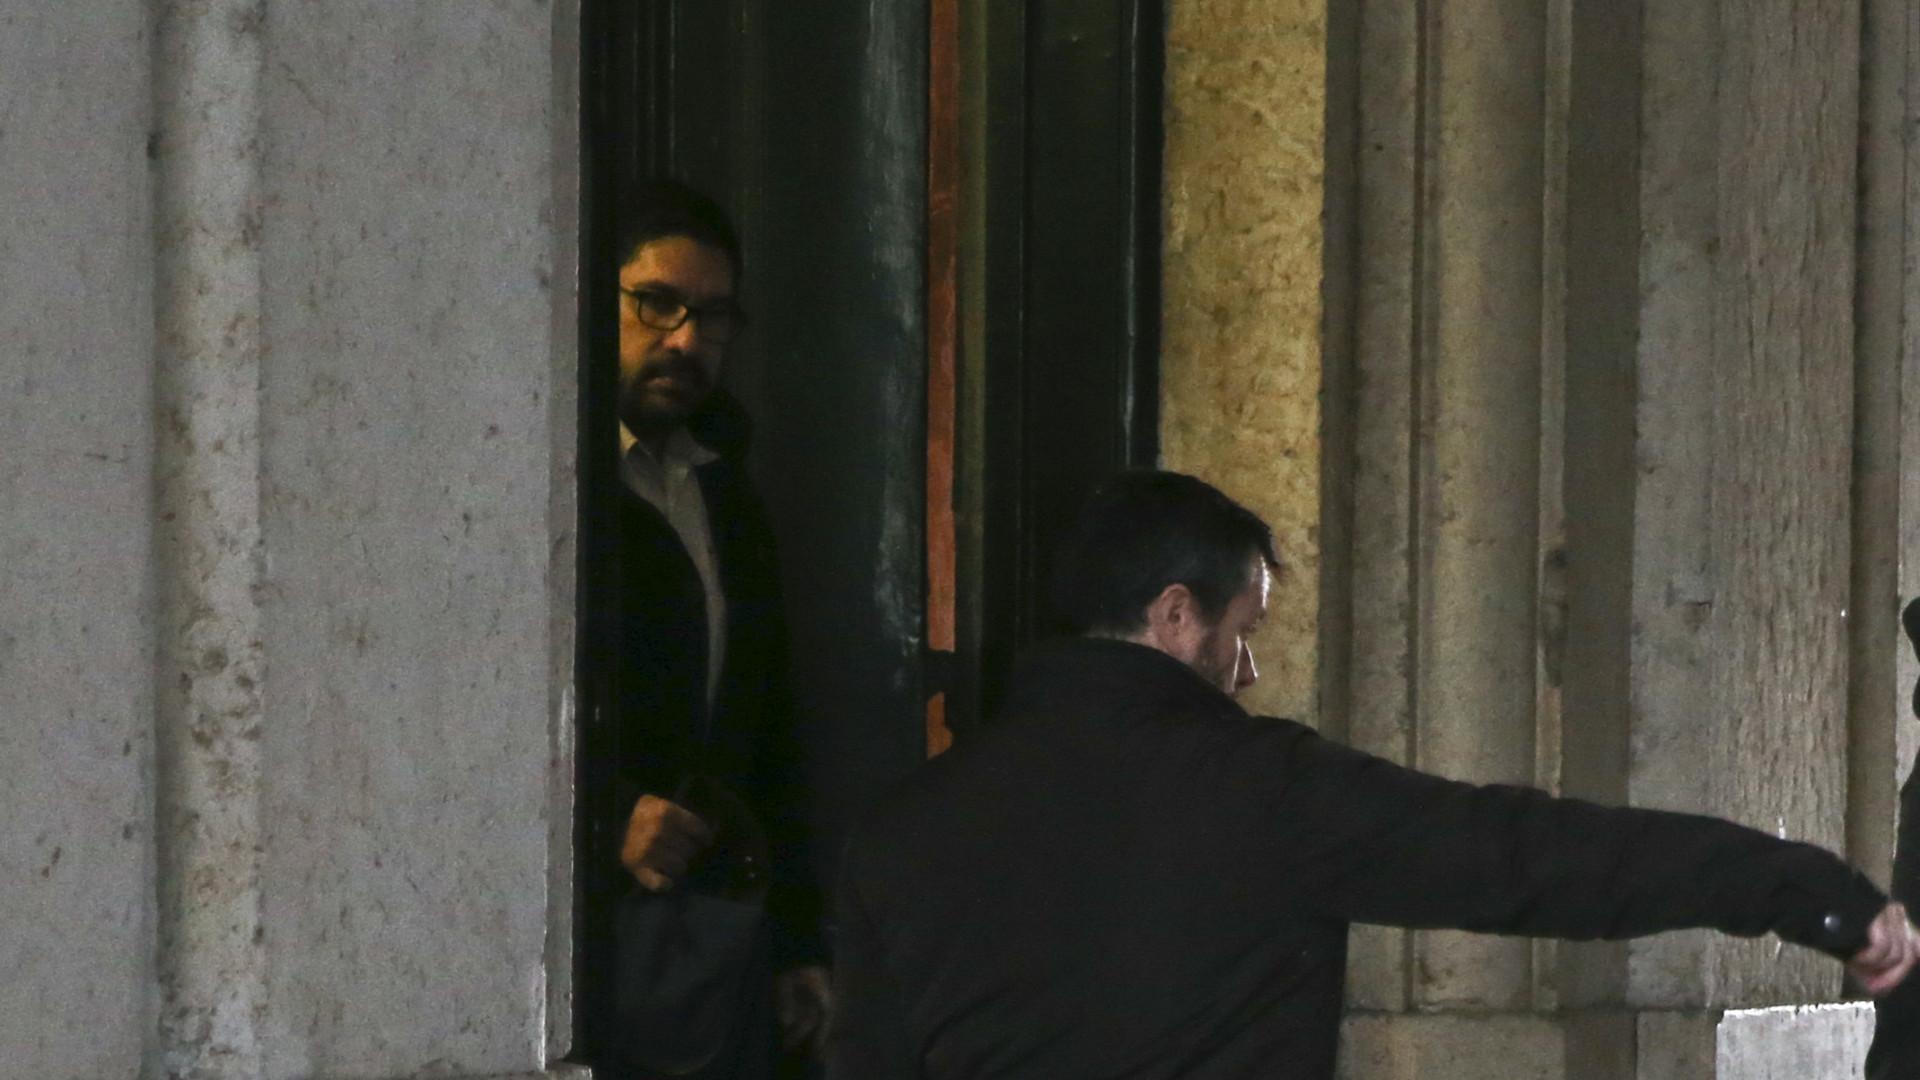 Supremo Tribunal de Justiça recusa libertar suspeito de Lava Jato